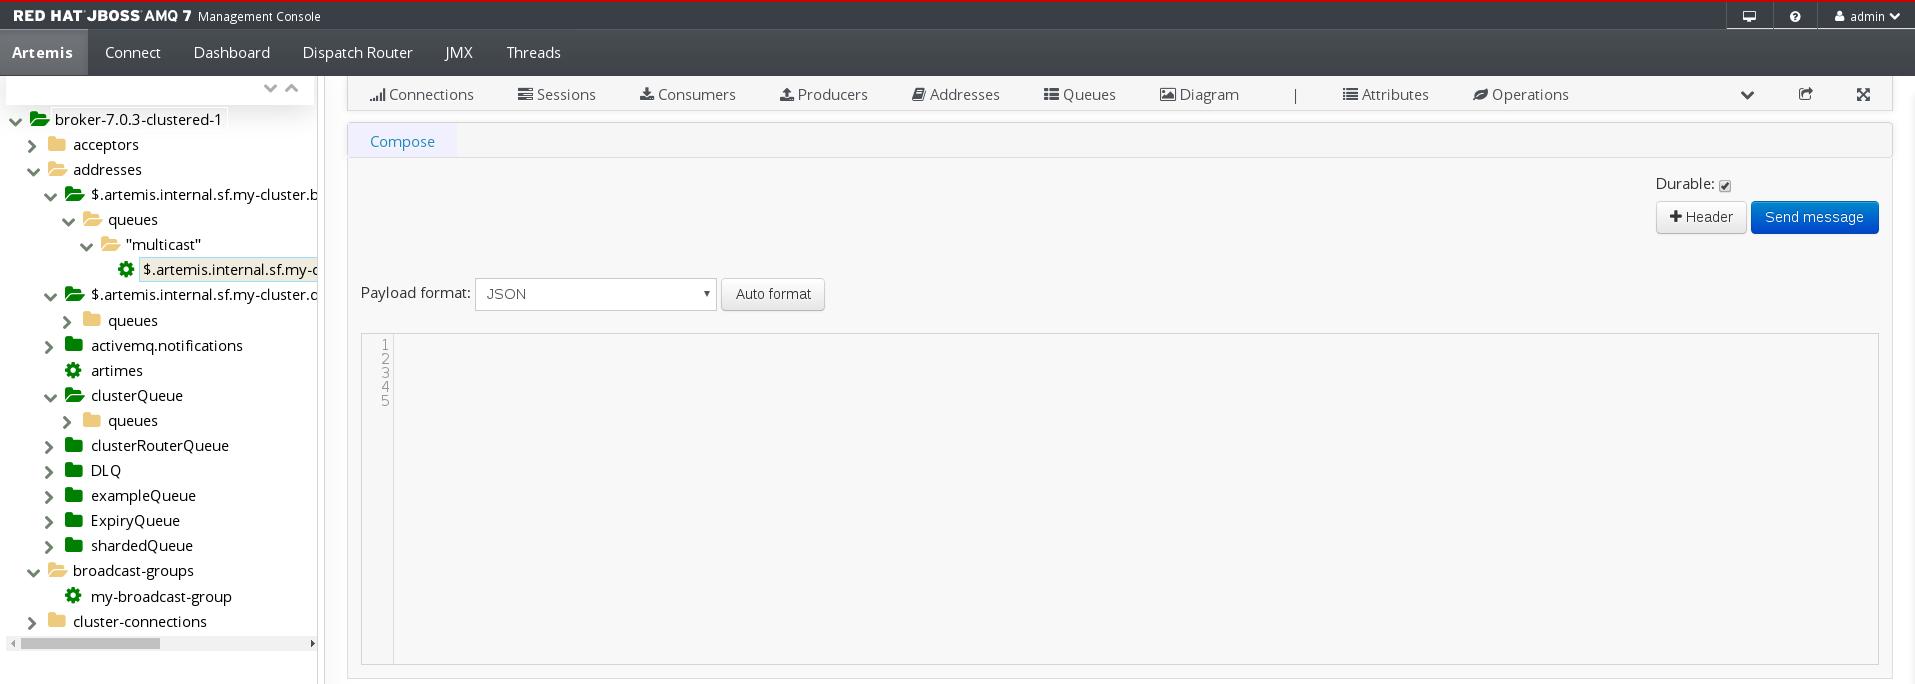 Managing AMQ Broker Red Hat AMQ 7 3   Red Hat Customer Portal